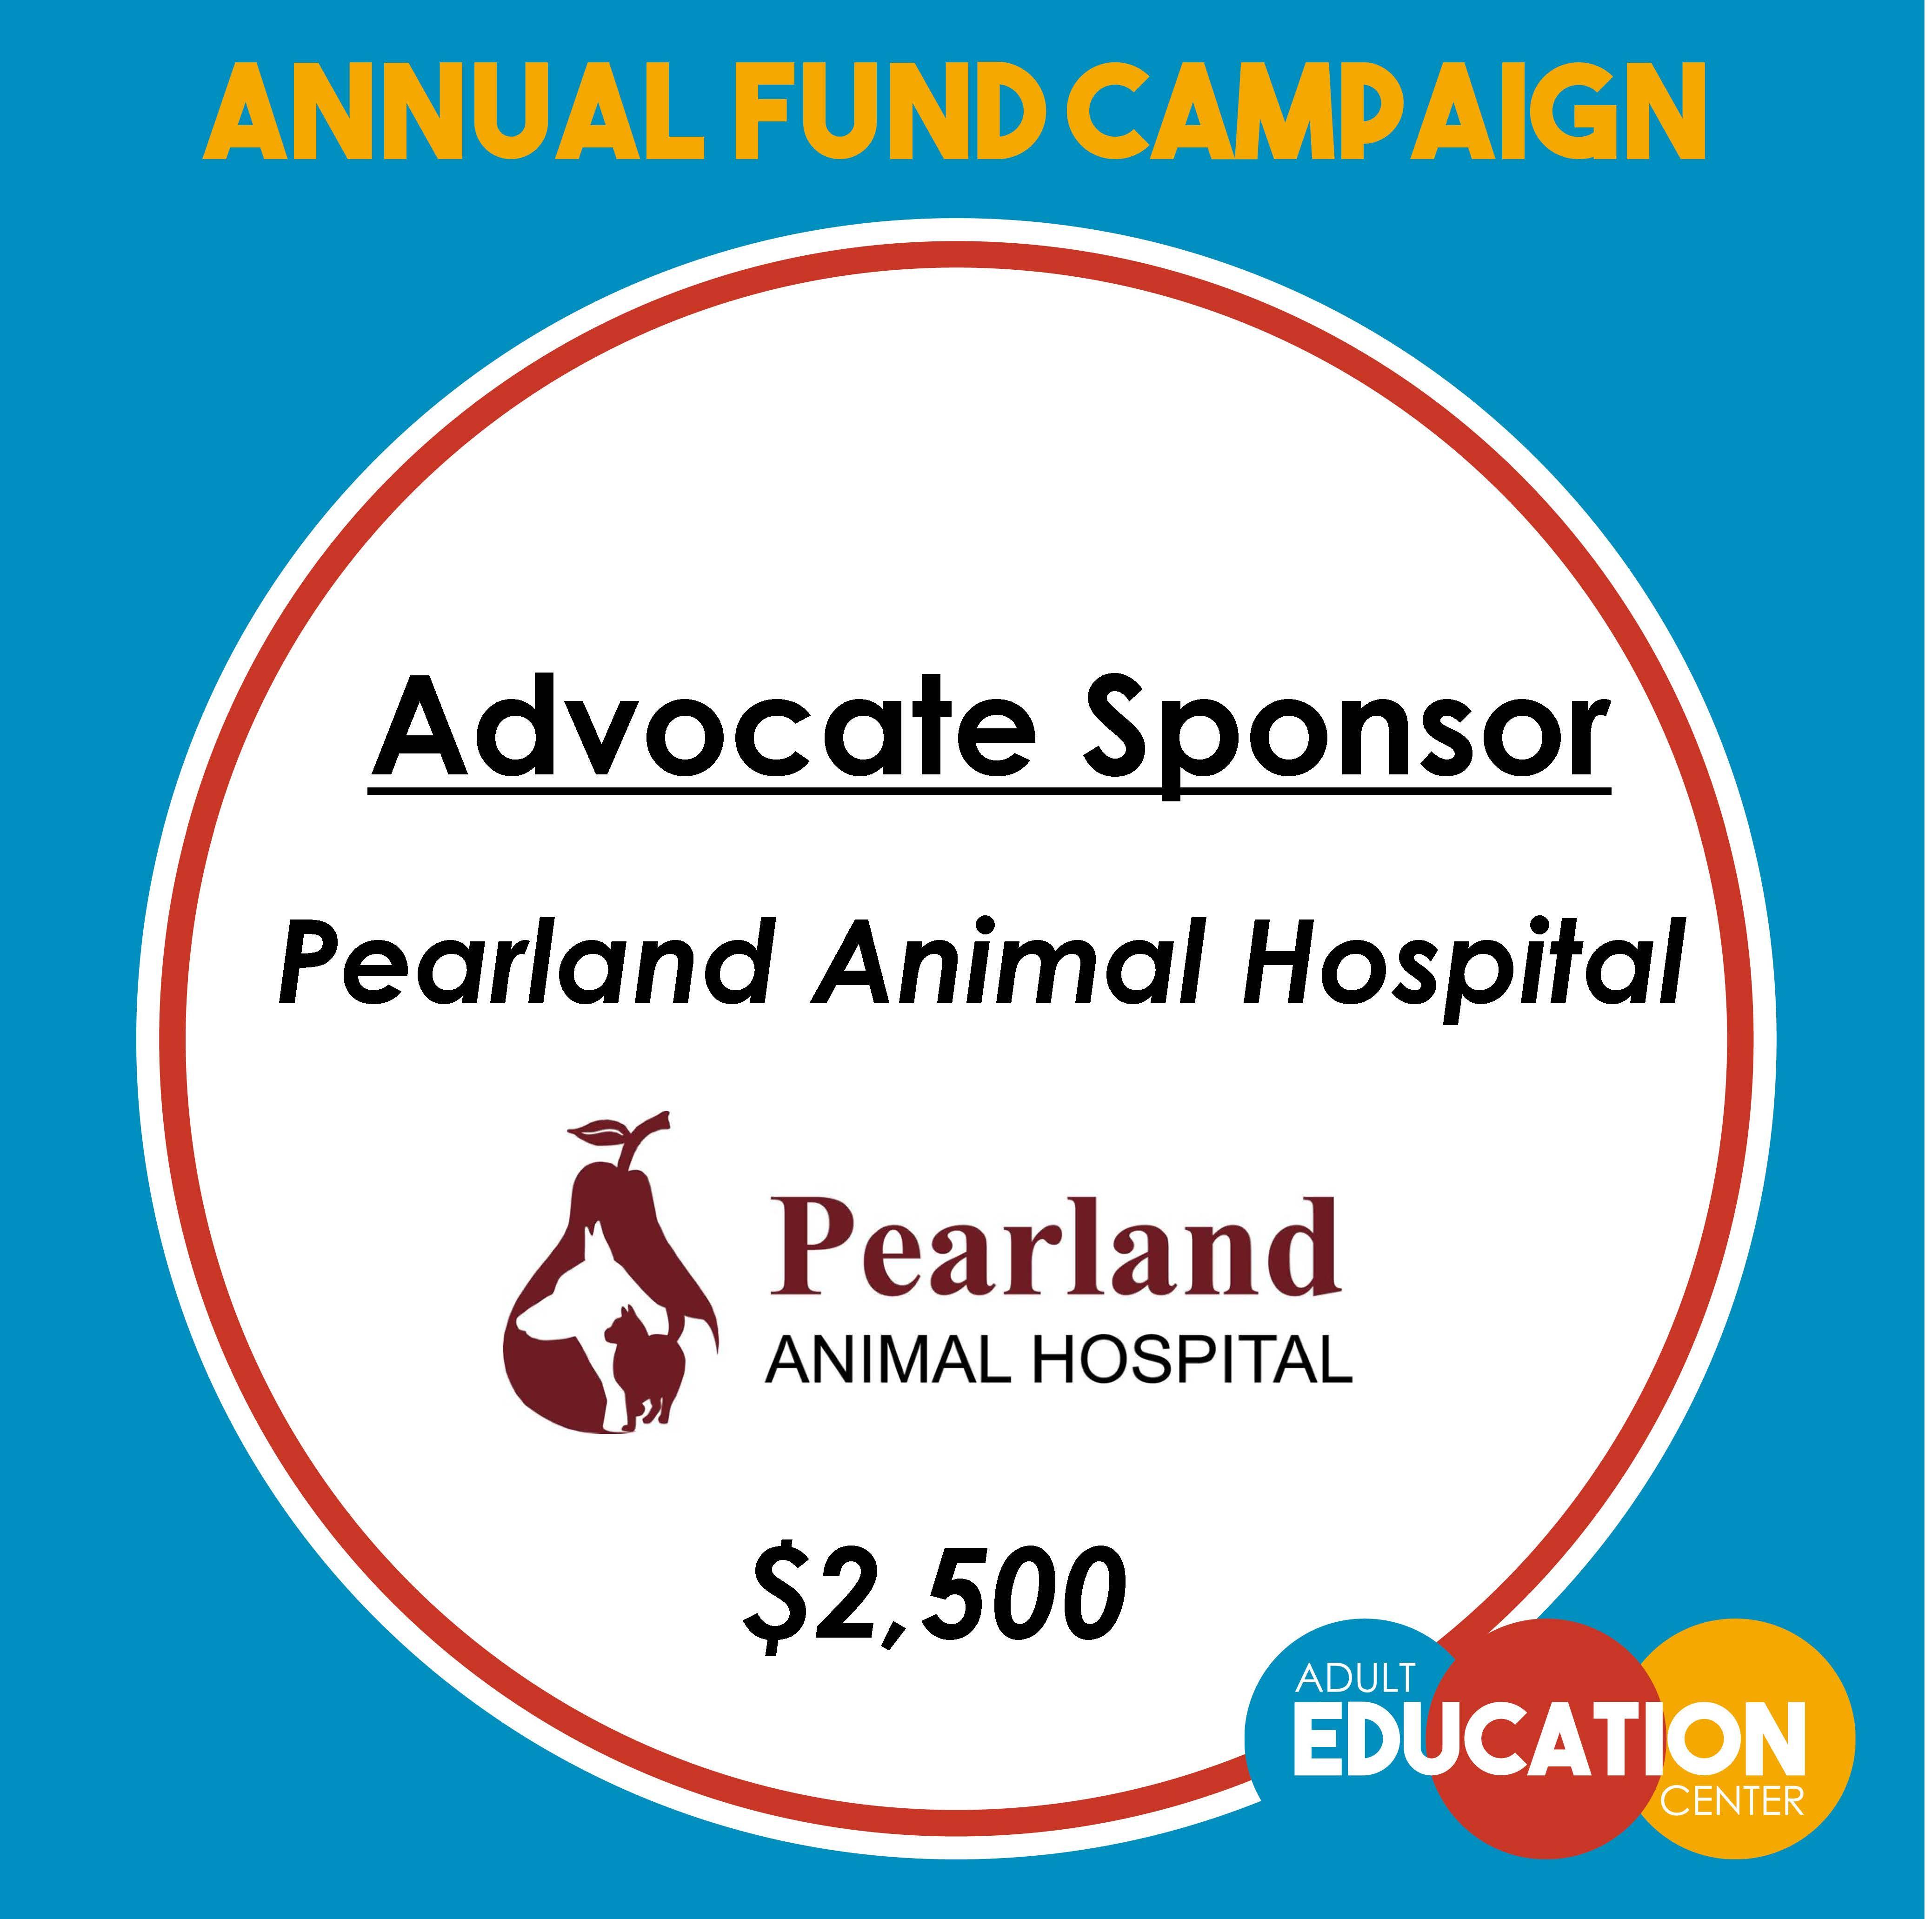 Pearland Animal Hospital - Advocate Sponsor - $2,500